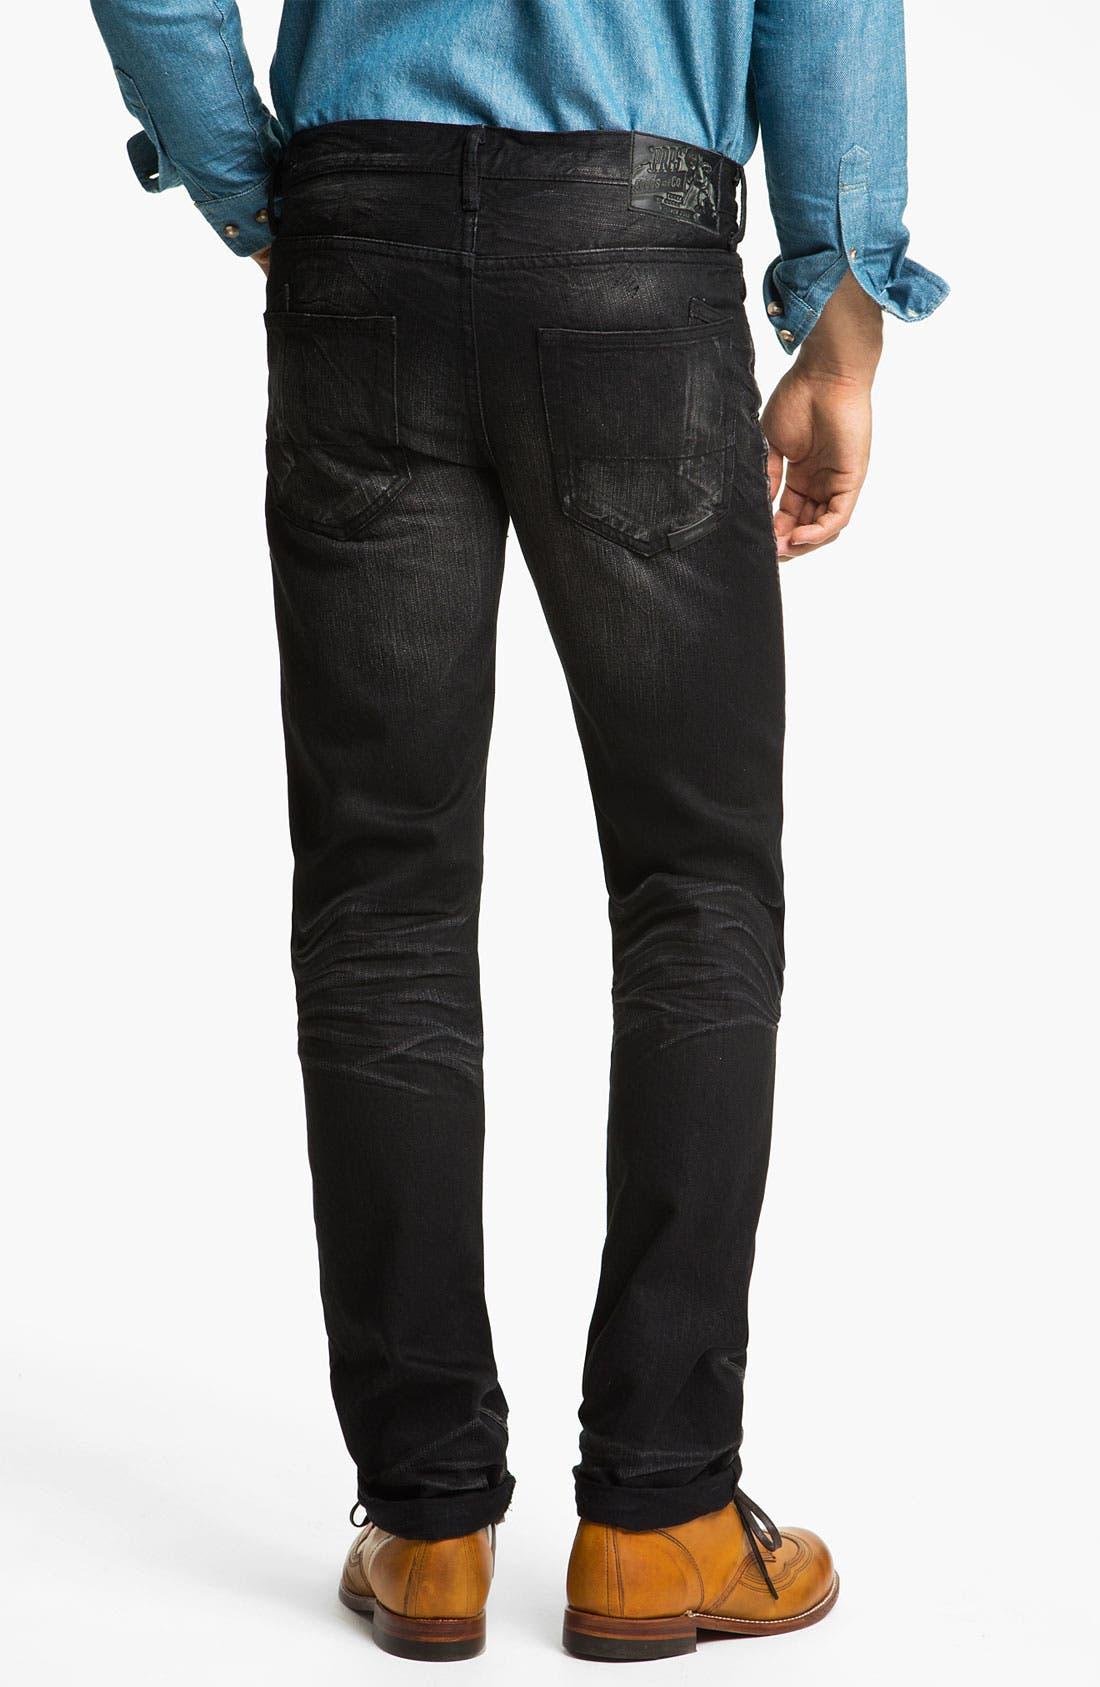 Main Image - PRPS 'Rambler' Slim Fit Jeans (Junko's Summit)